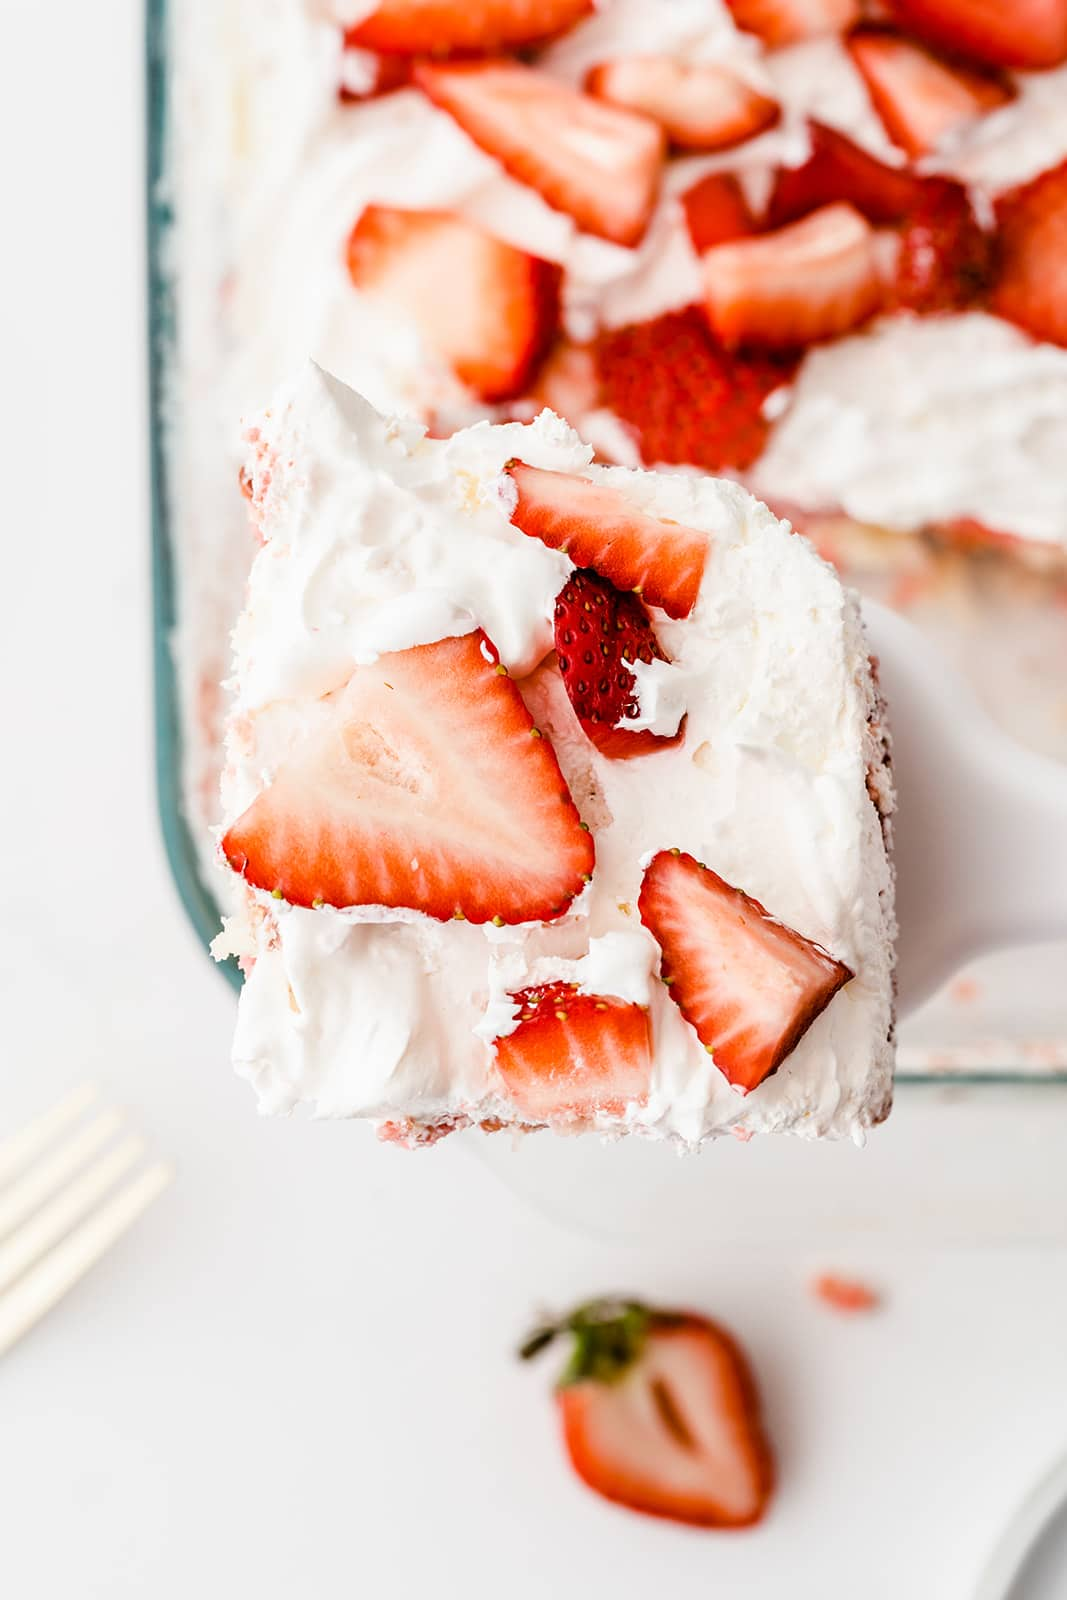 close up of a piece of strawberry poke cake